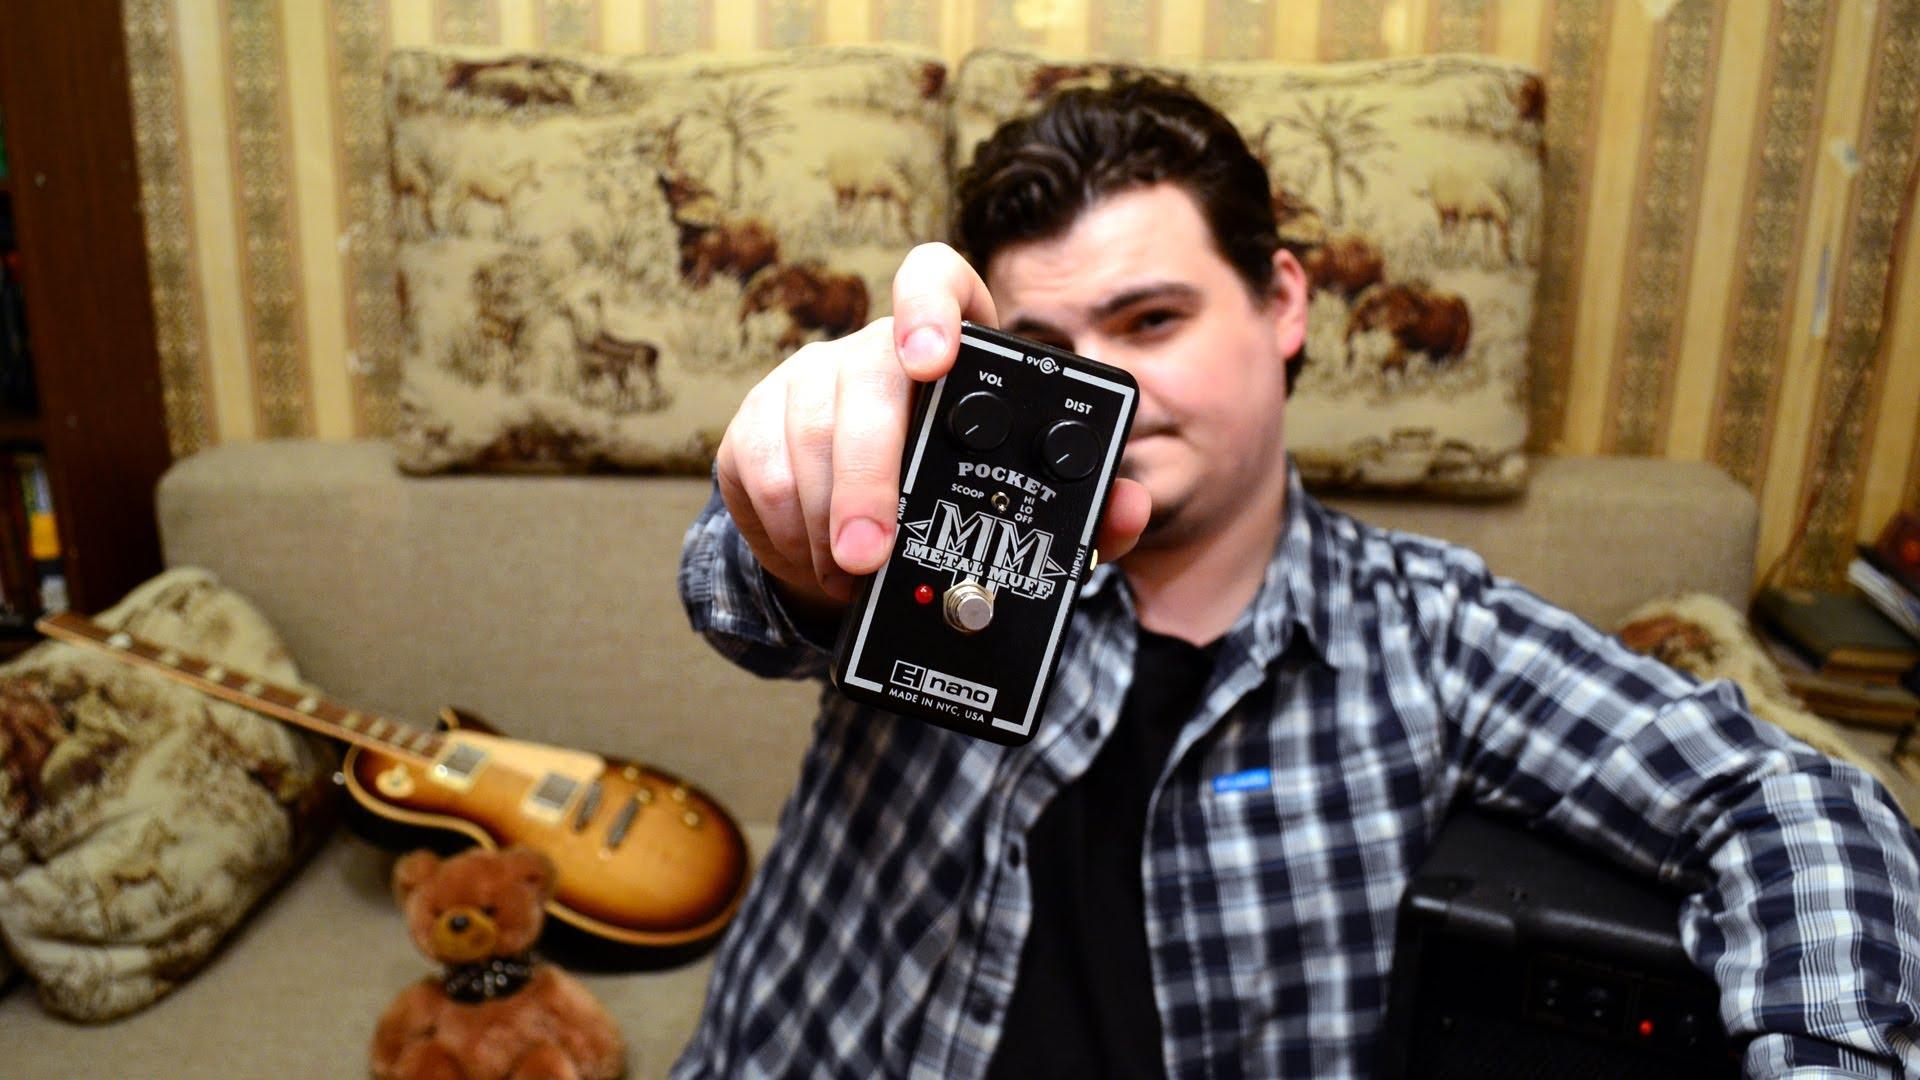 Рокин Факин 35 - Electro-Harmonix Pocket Metal Muff (США)